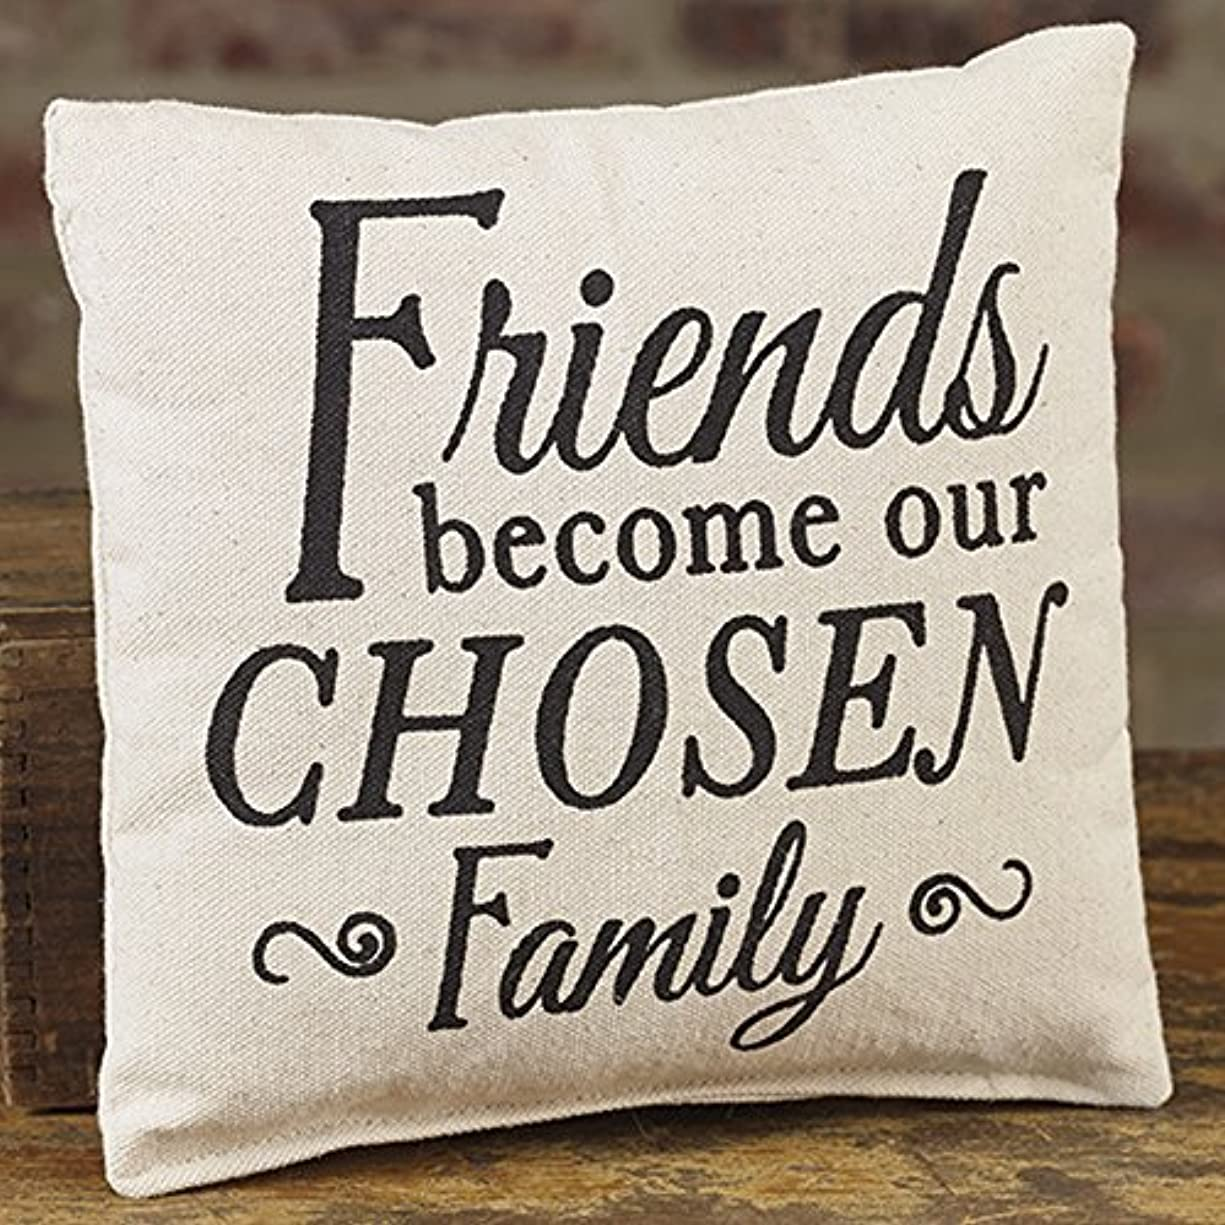 大聖堂円周乞食Friends Chosen Family 8 x 8 Canvas Decorative Throw Pillow [並行輸入品]